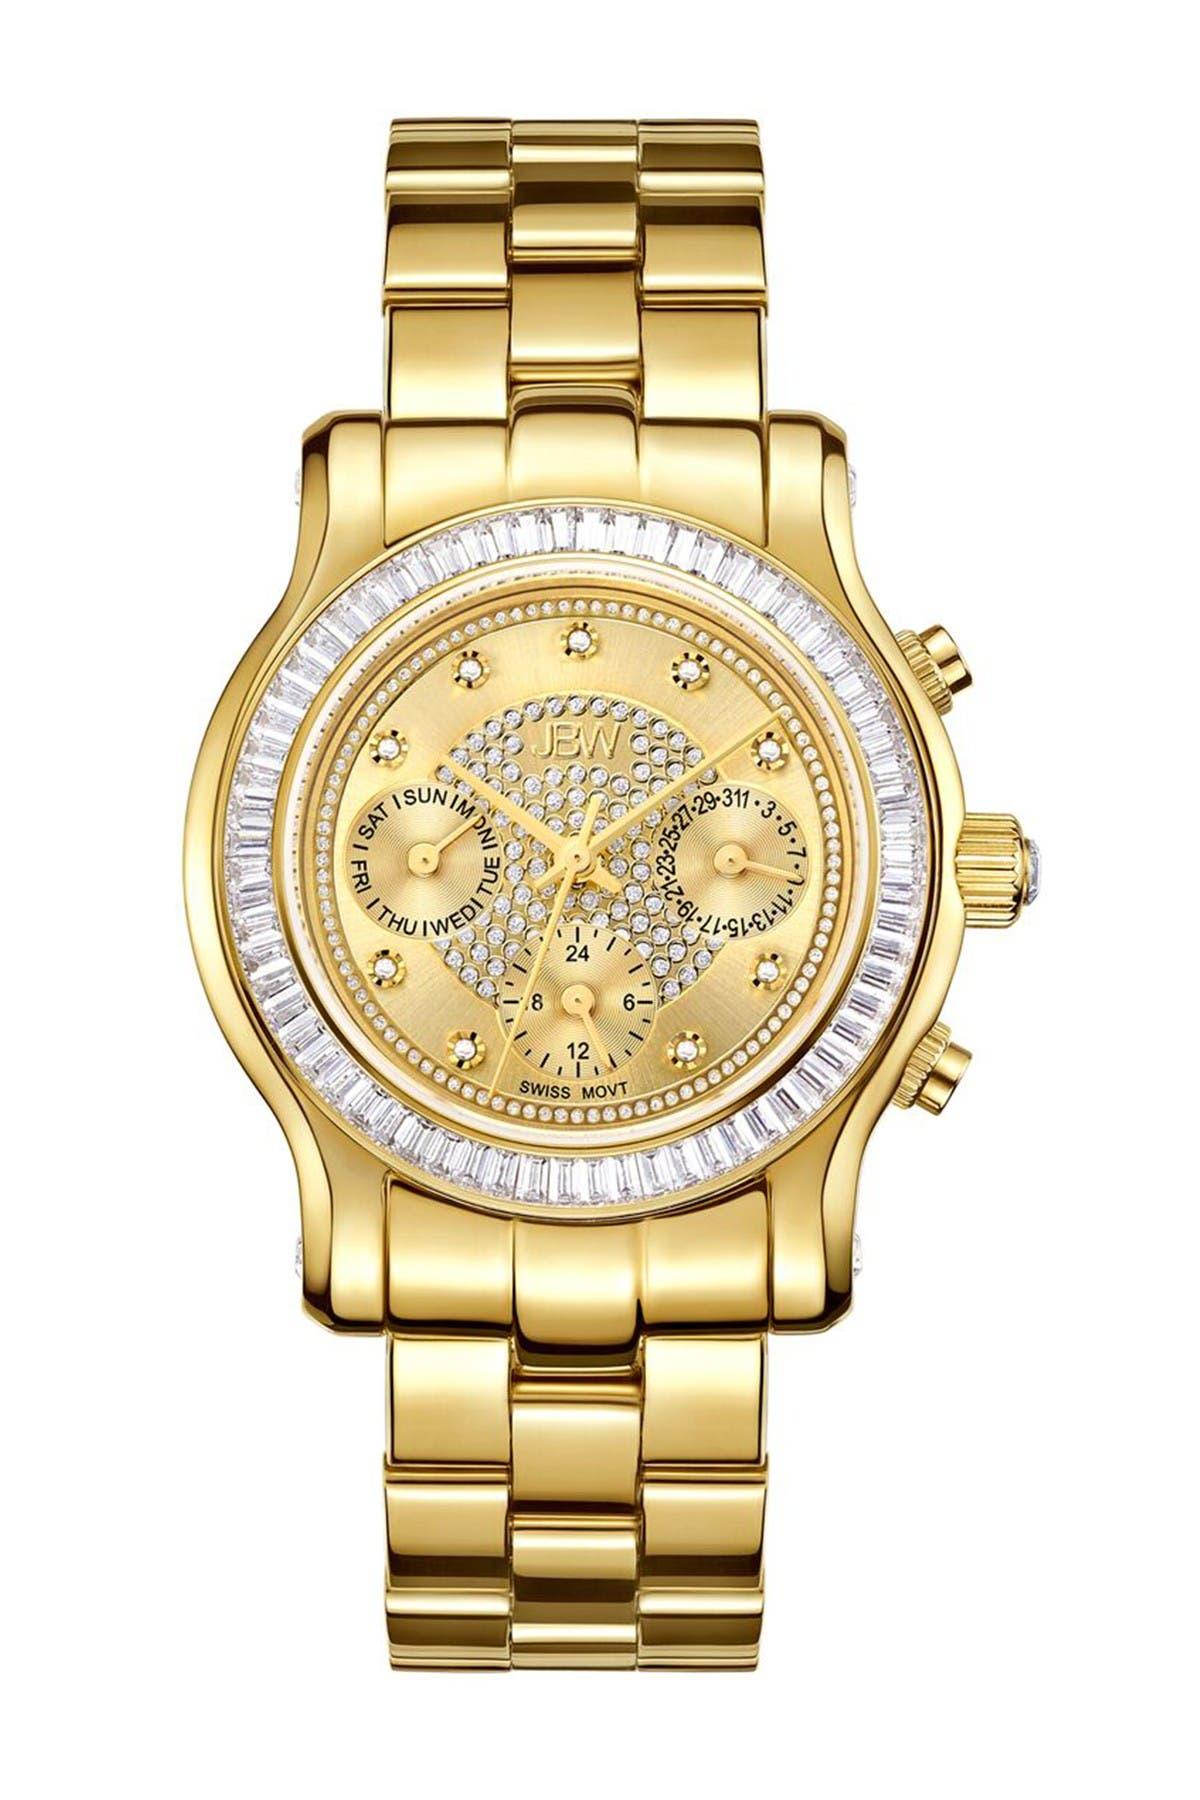 Image of JBW Women's Laurel 18K Gold Plated Stainless Steel Diamond Bracelet Watch, 38mm - 0.09 ctw